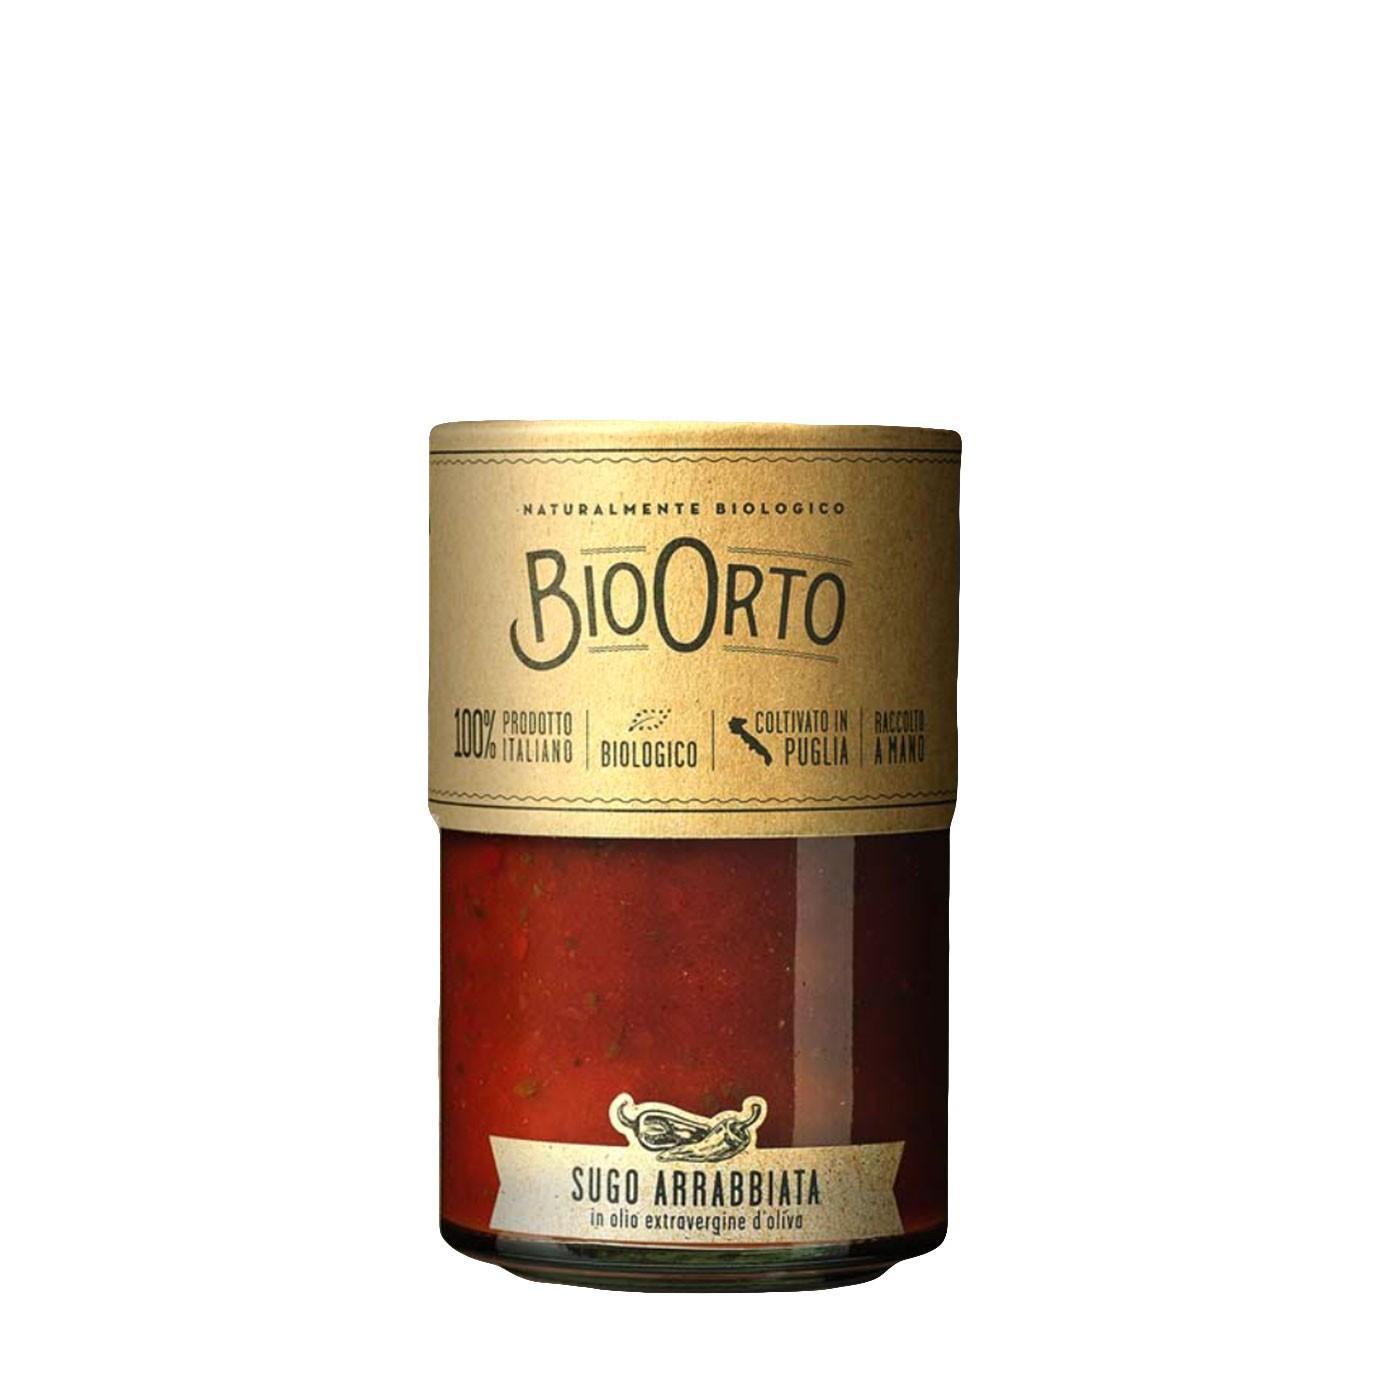 Organic Arrabbiata Sauce 19.4 oz